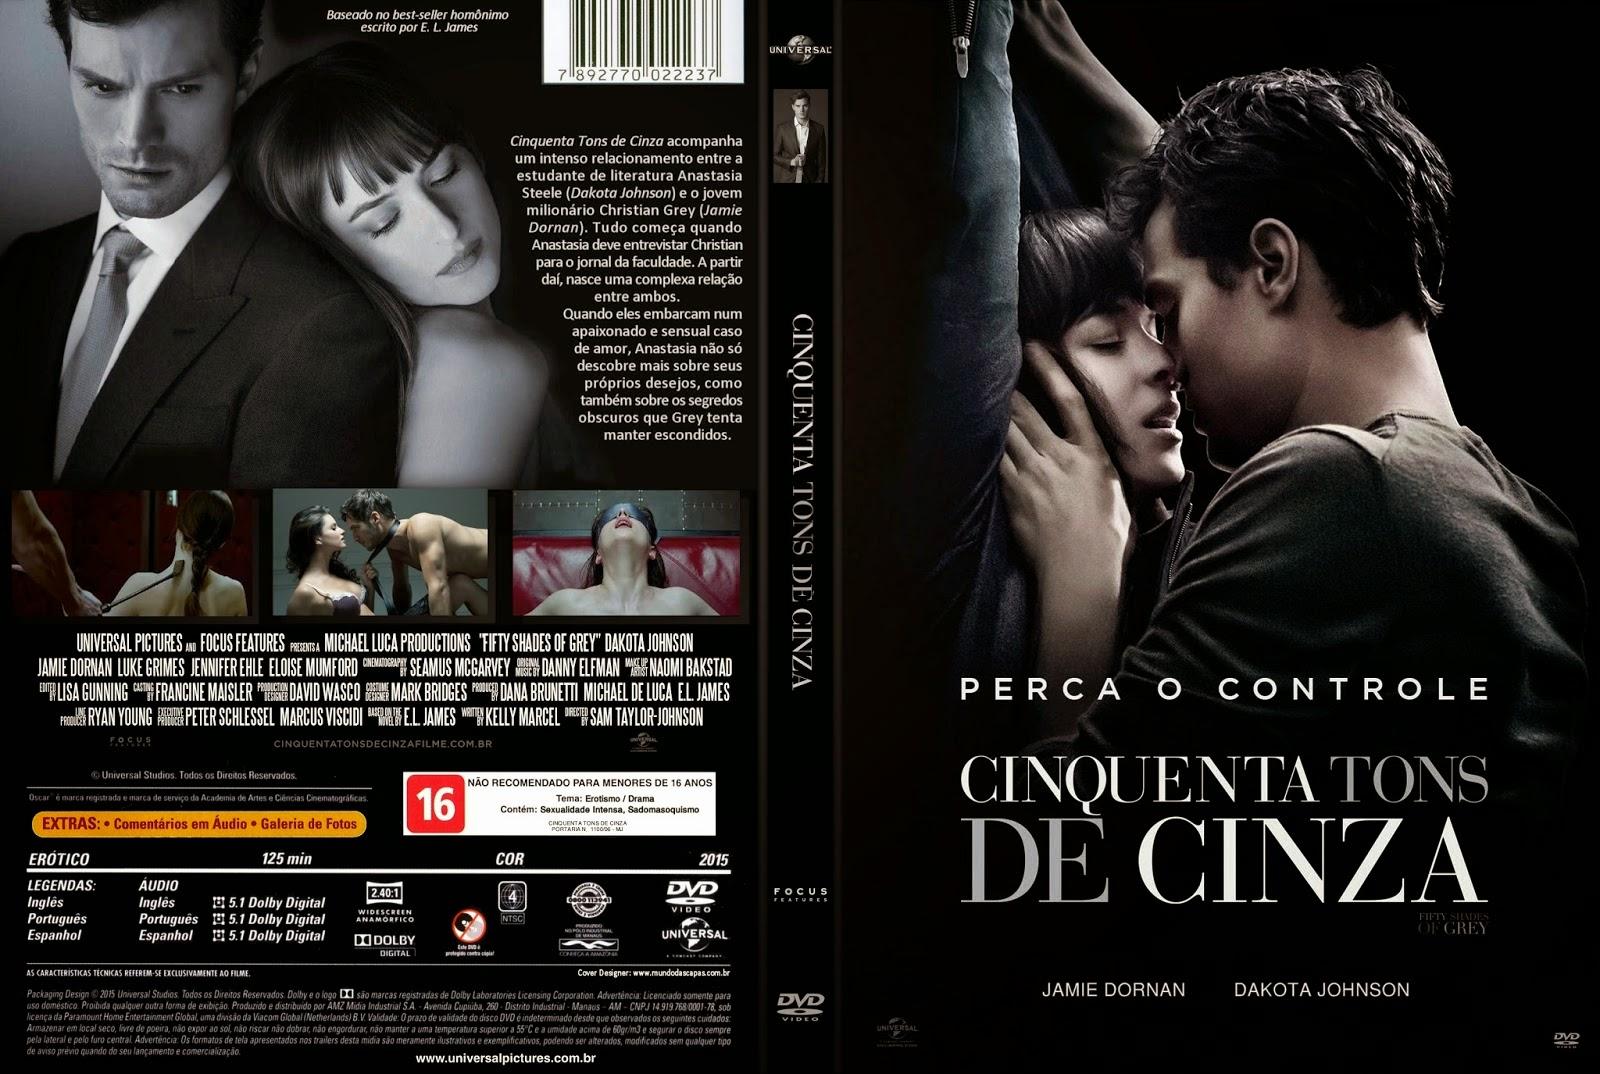 CAPAS de DVDs Buiu de Jesus: CINQUENTA TONS DE CINZA